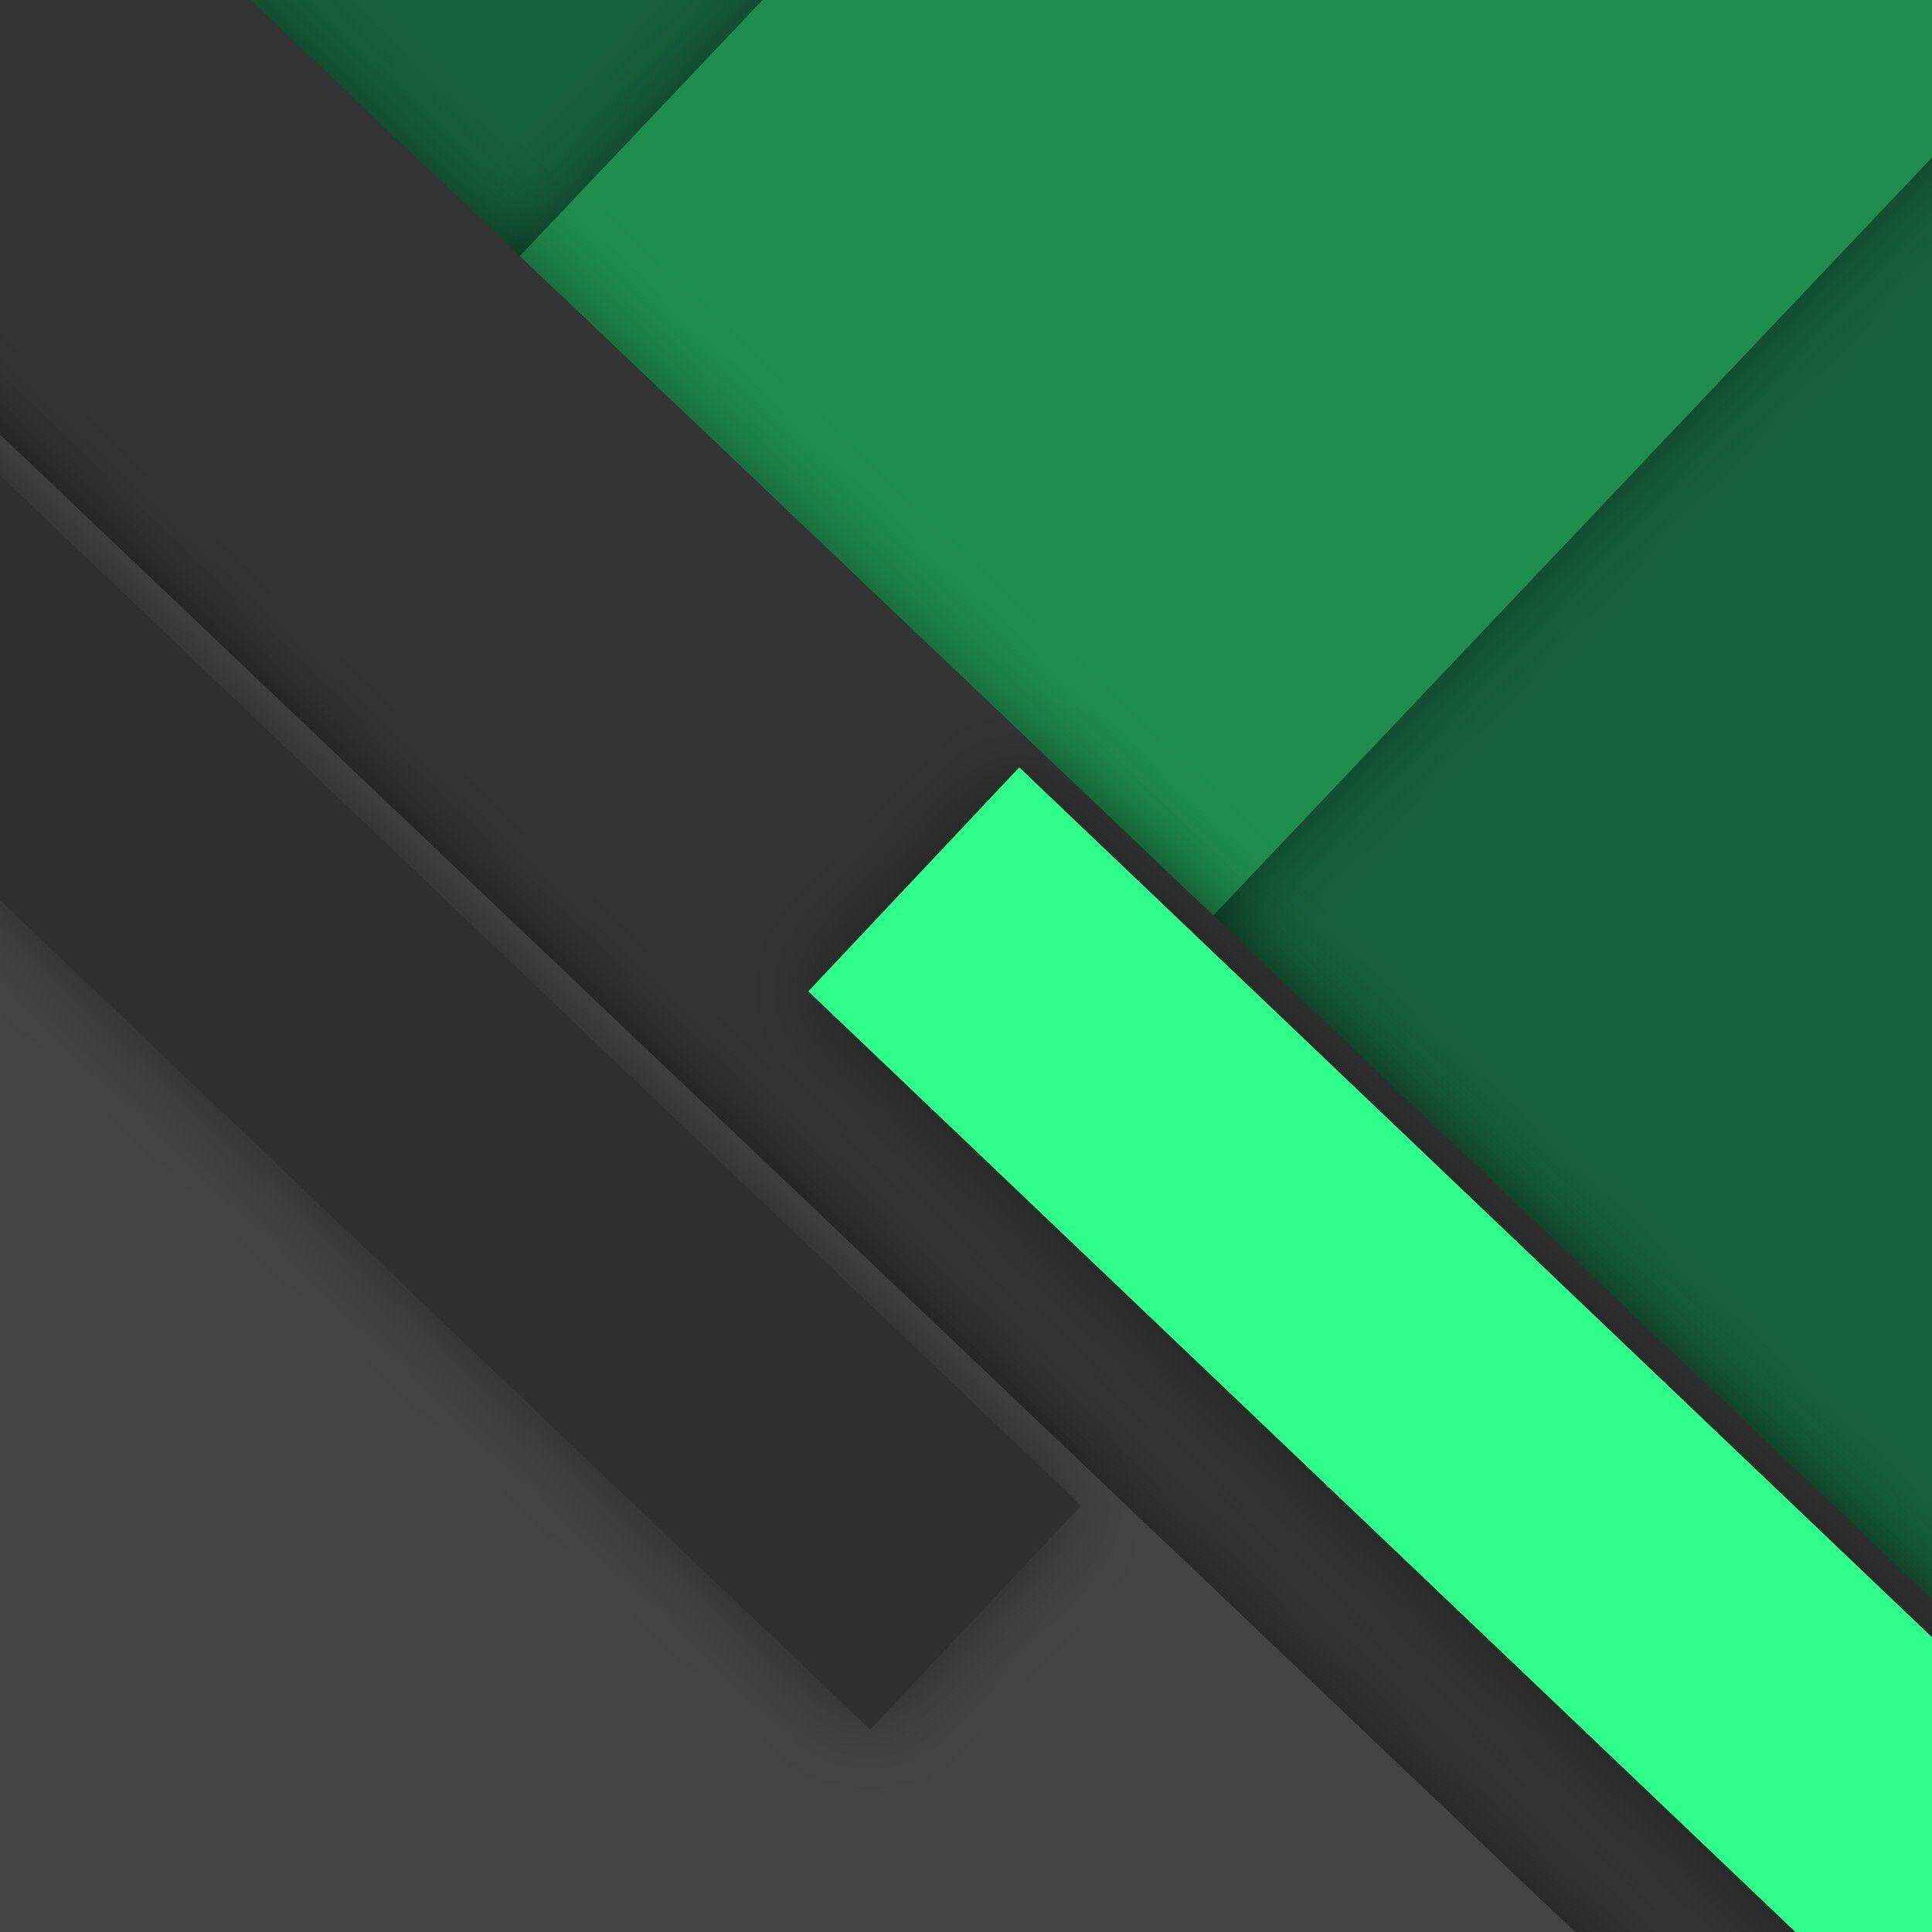 Material design wallpaper | iOS / Android / Material ...